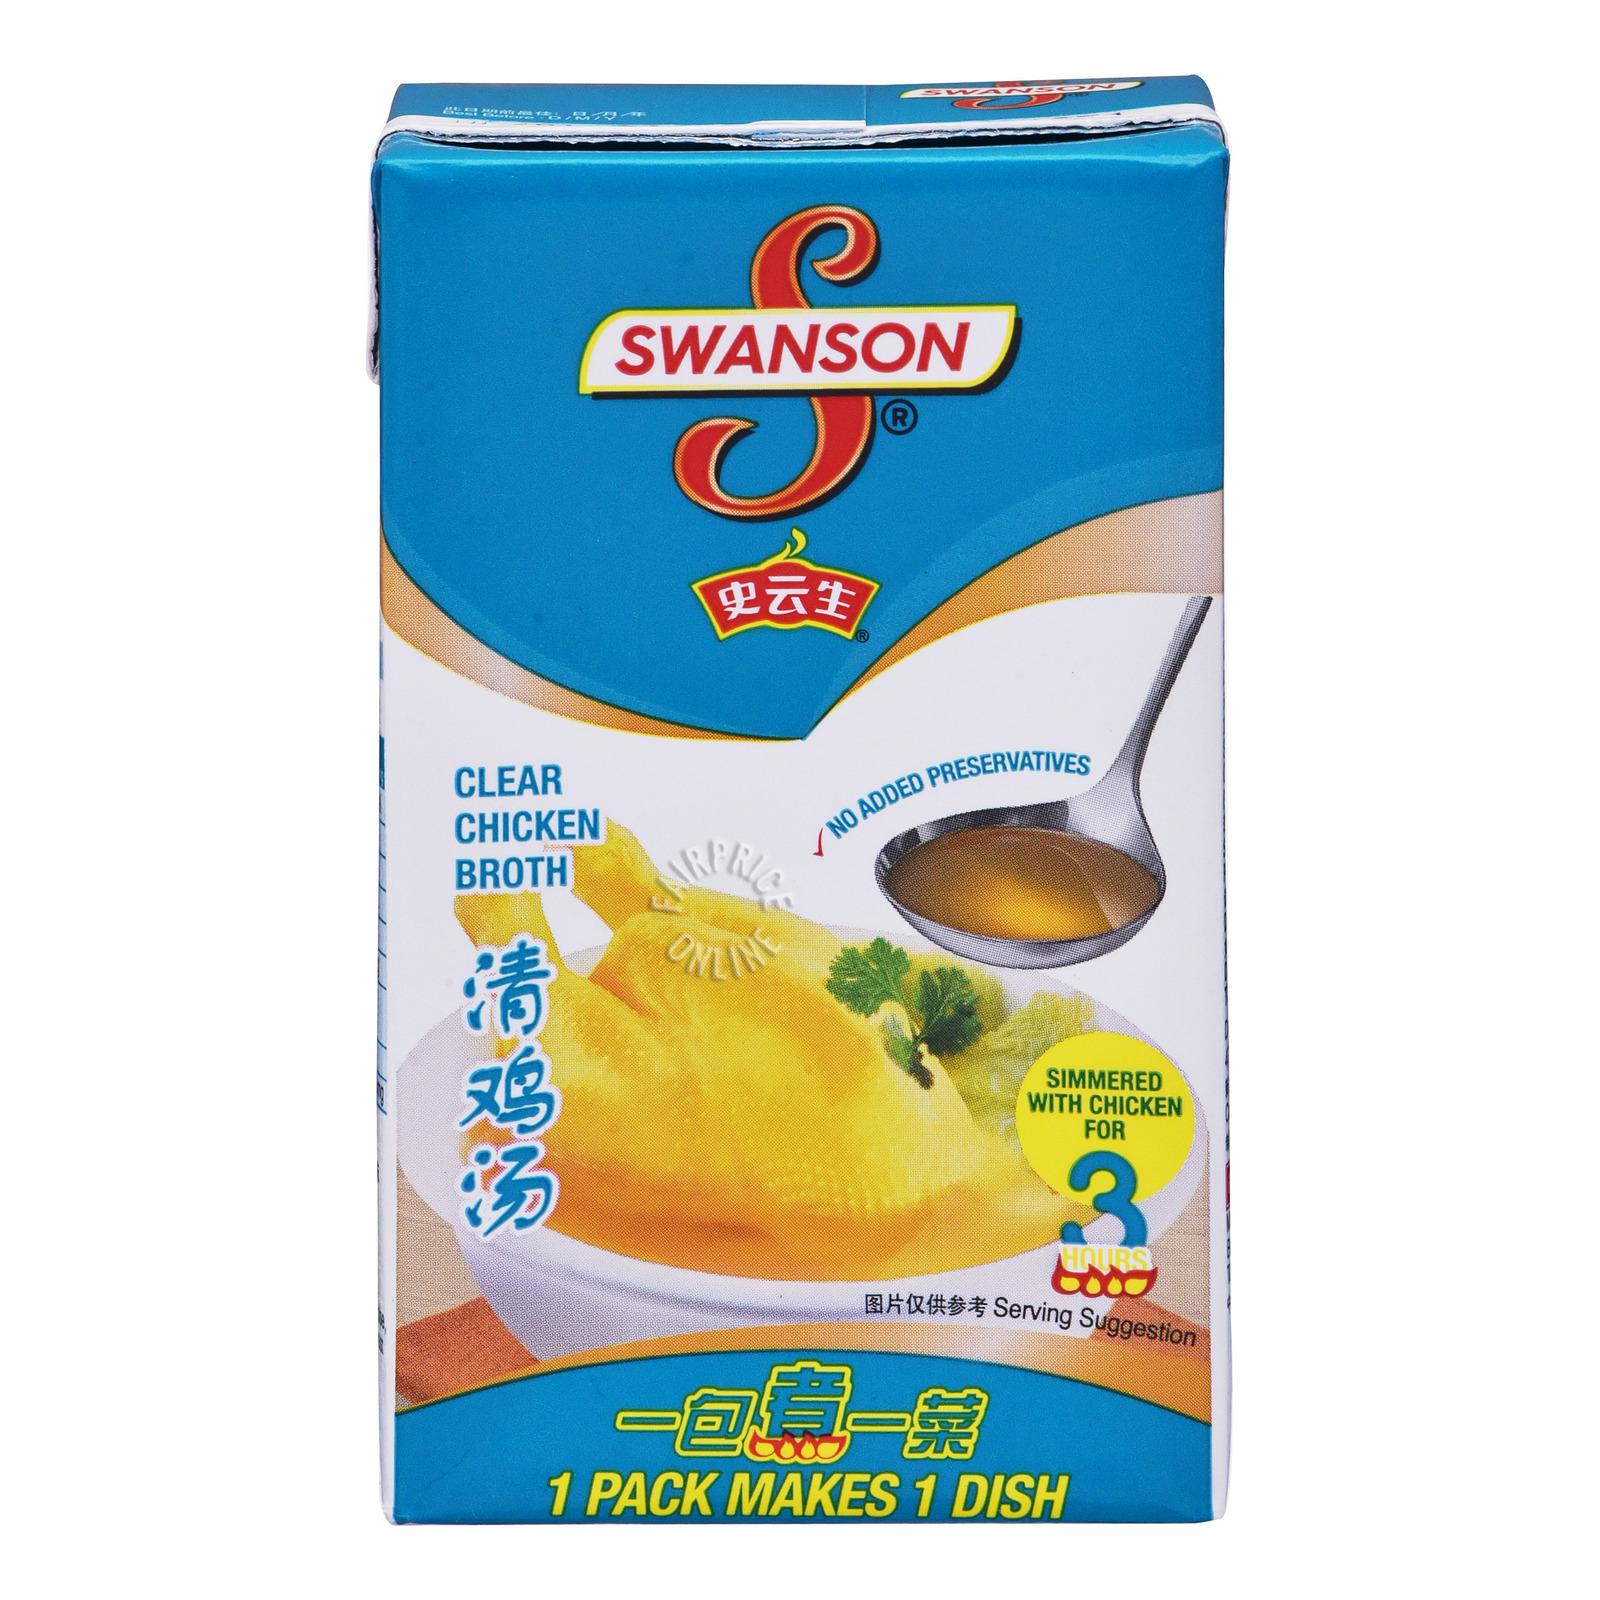 Swanson Clear Chicken Broth